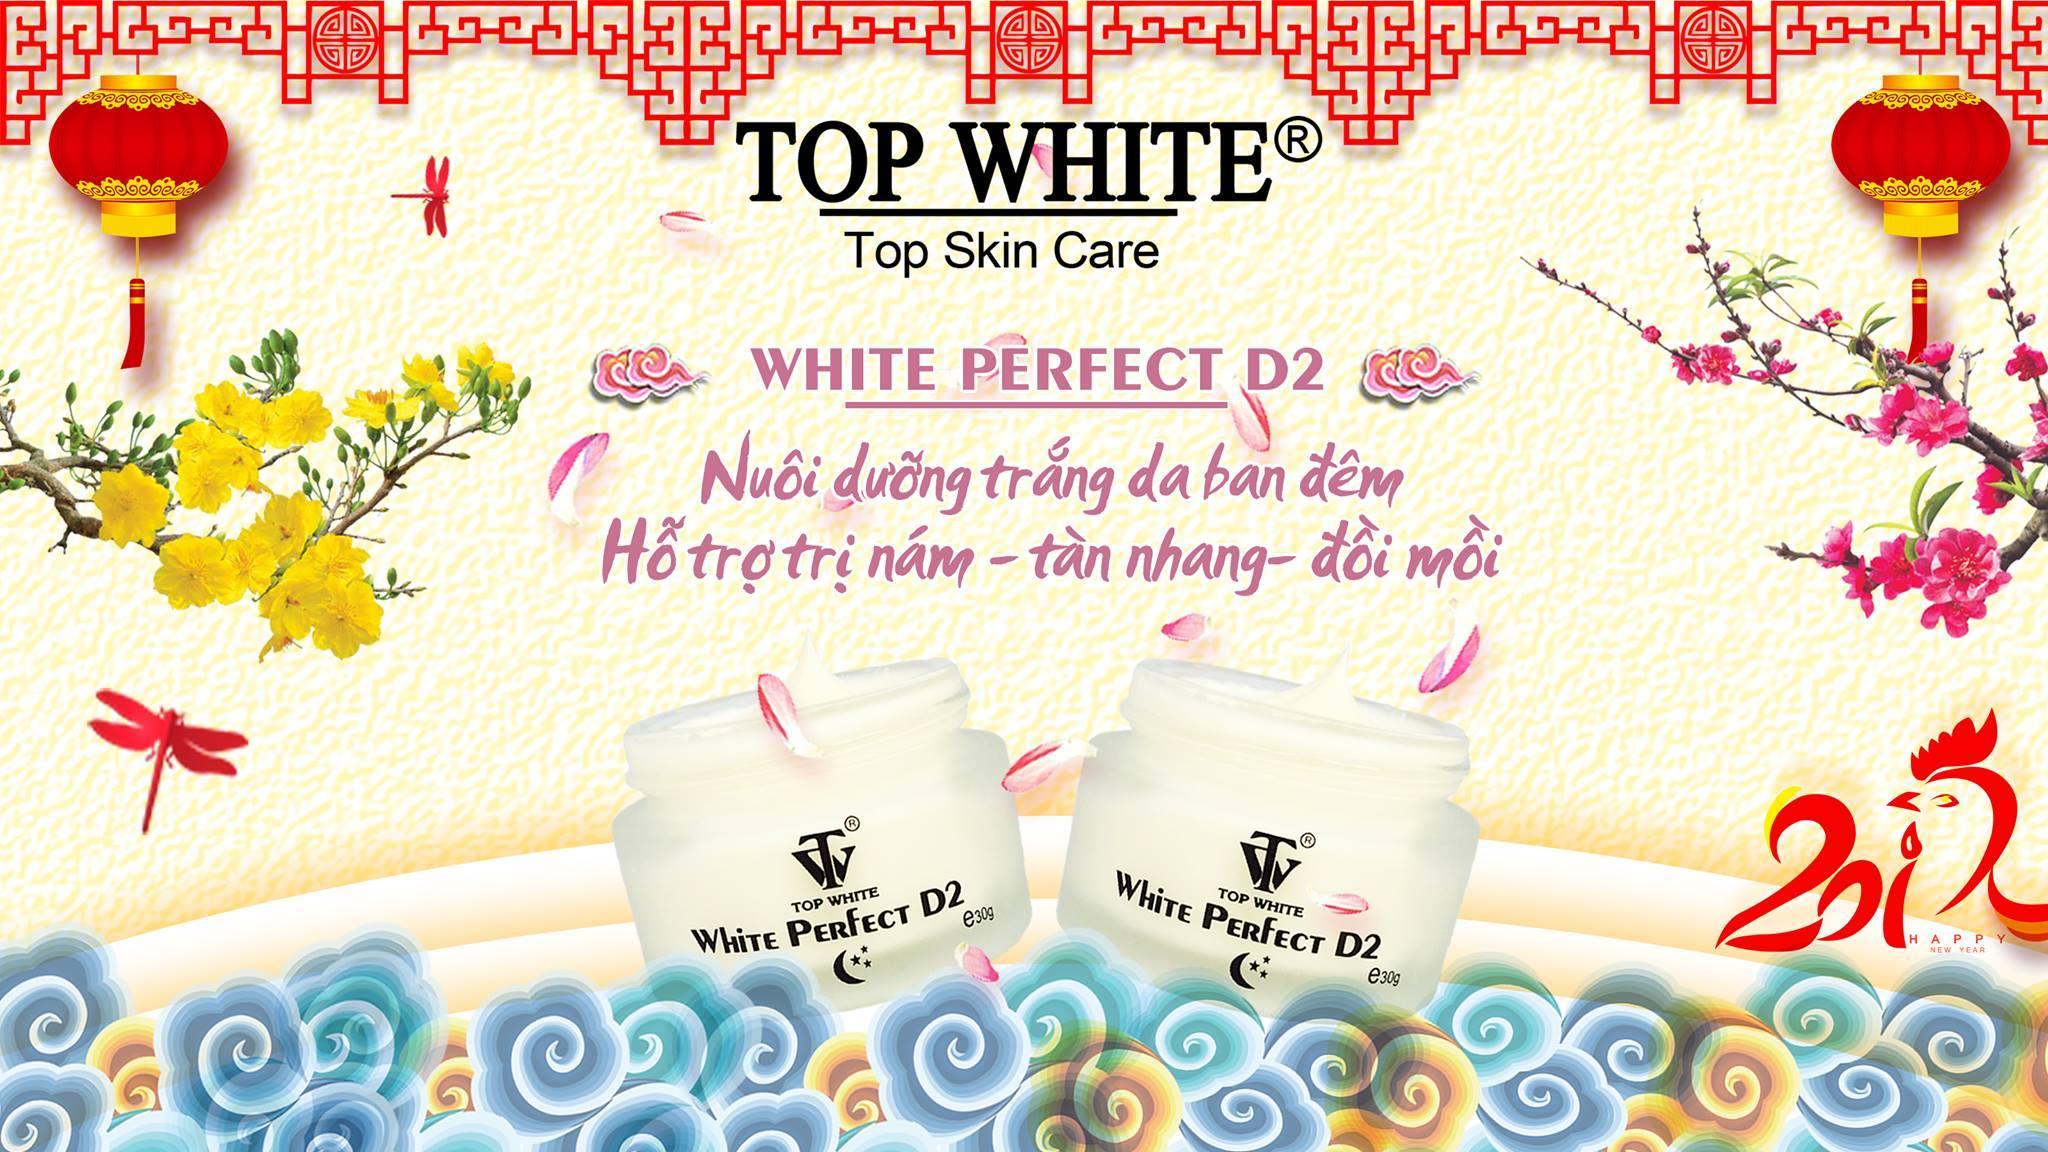 Top White kem dưỡng trắng da ban đêm White Perfect D2